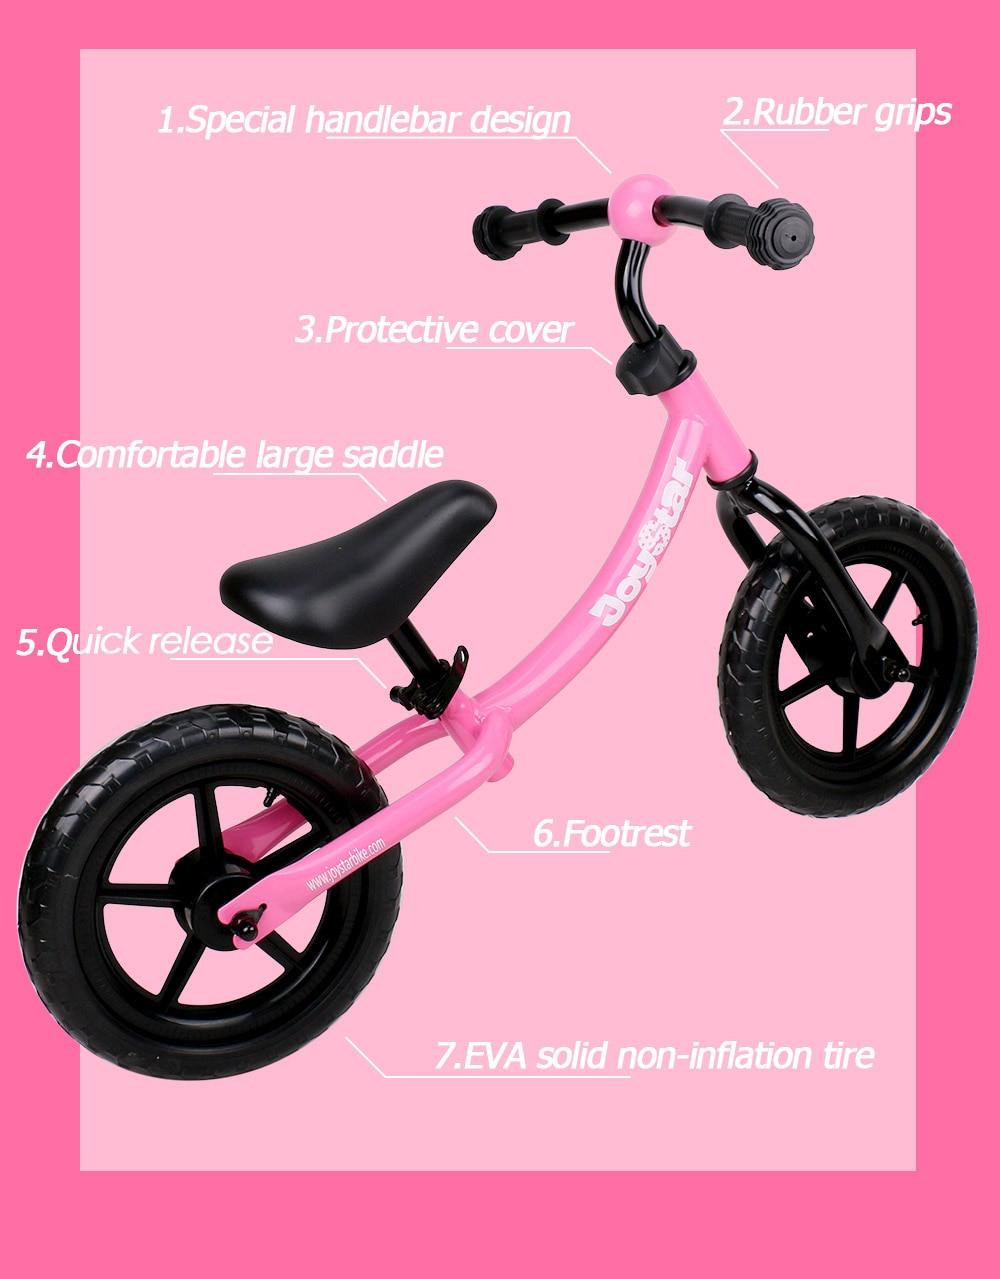 HTB1qJOSbfjsK1Rjy1Xaq6zispXau 10 & 12 Inch Balance Bike Ultralight Kids Riding Bicycle 1-3 Years Kids Learn to Ride Sports Balance Bike Ride on Toys Child Bike